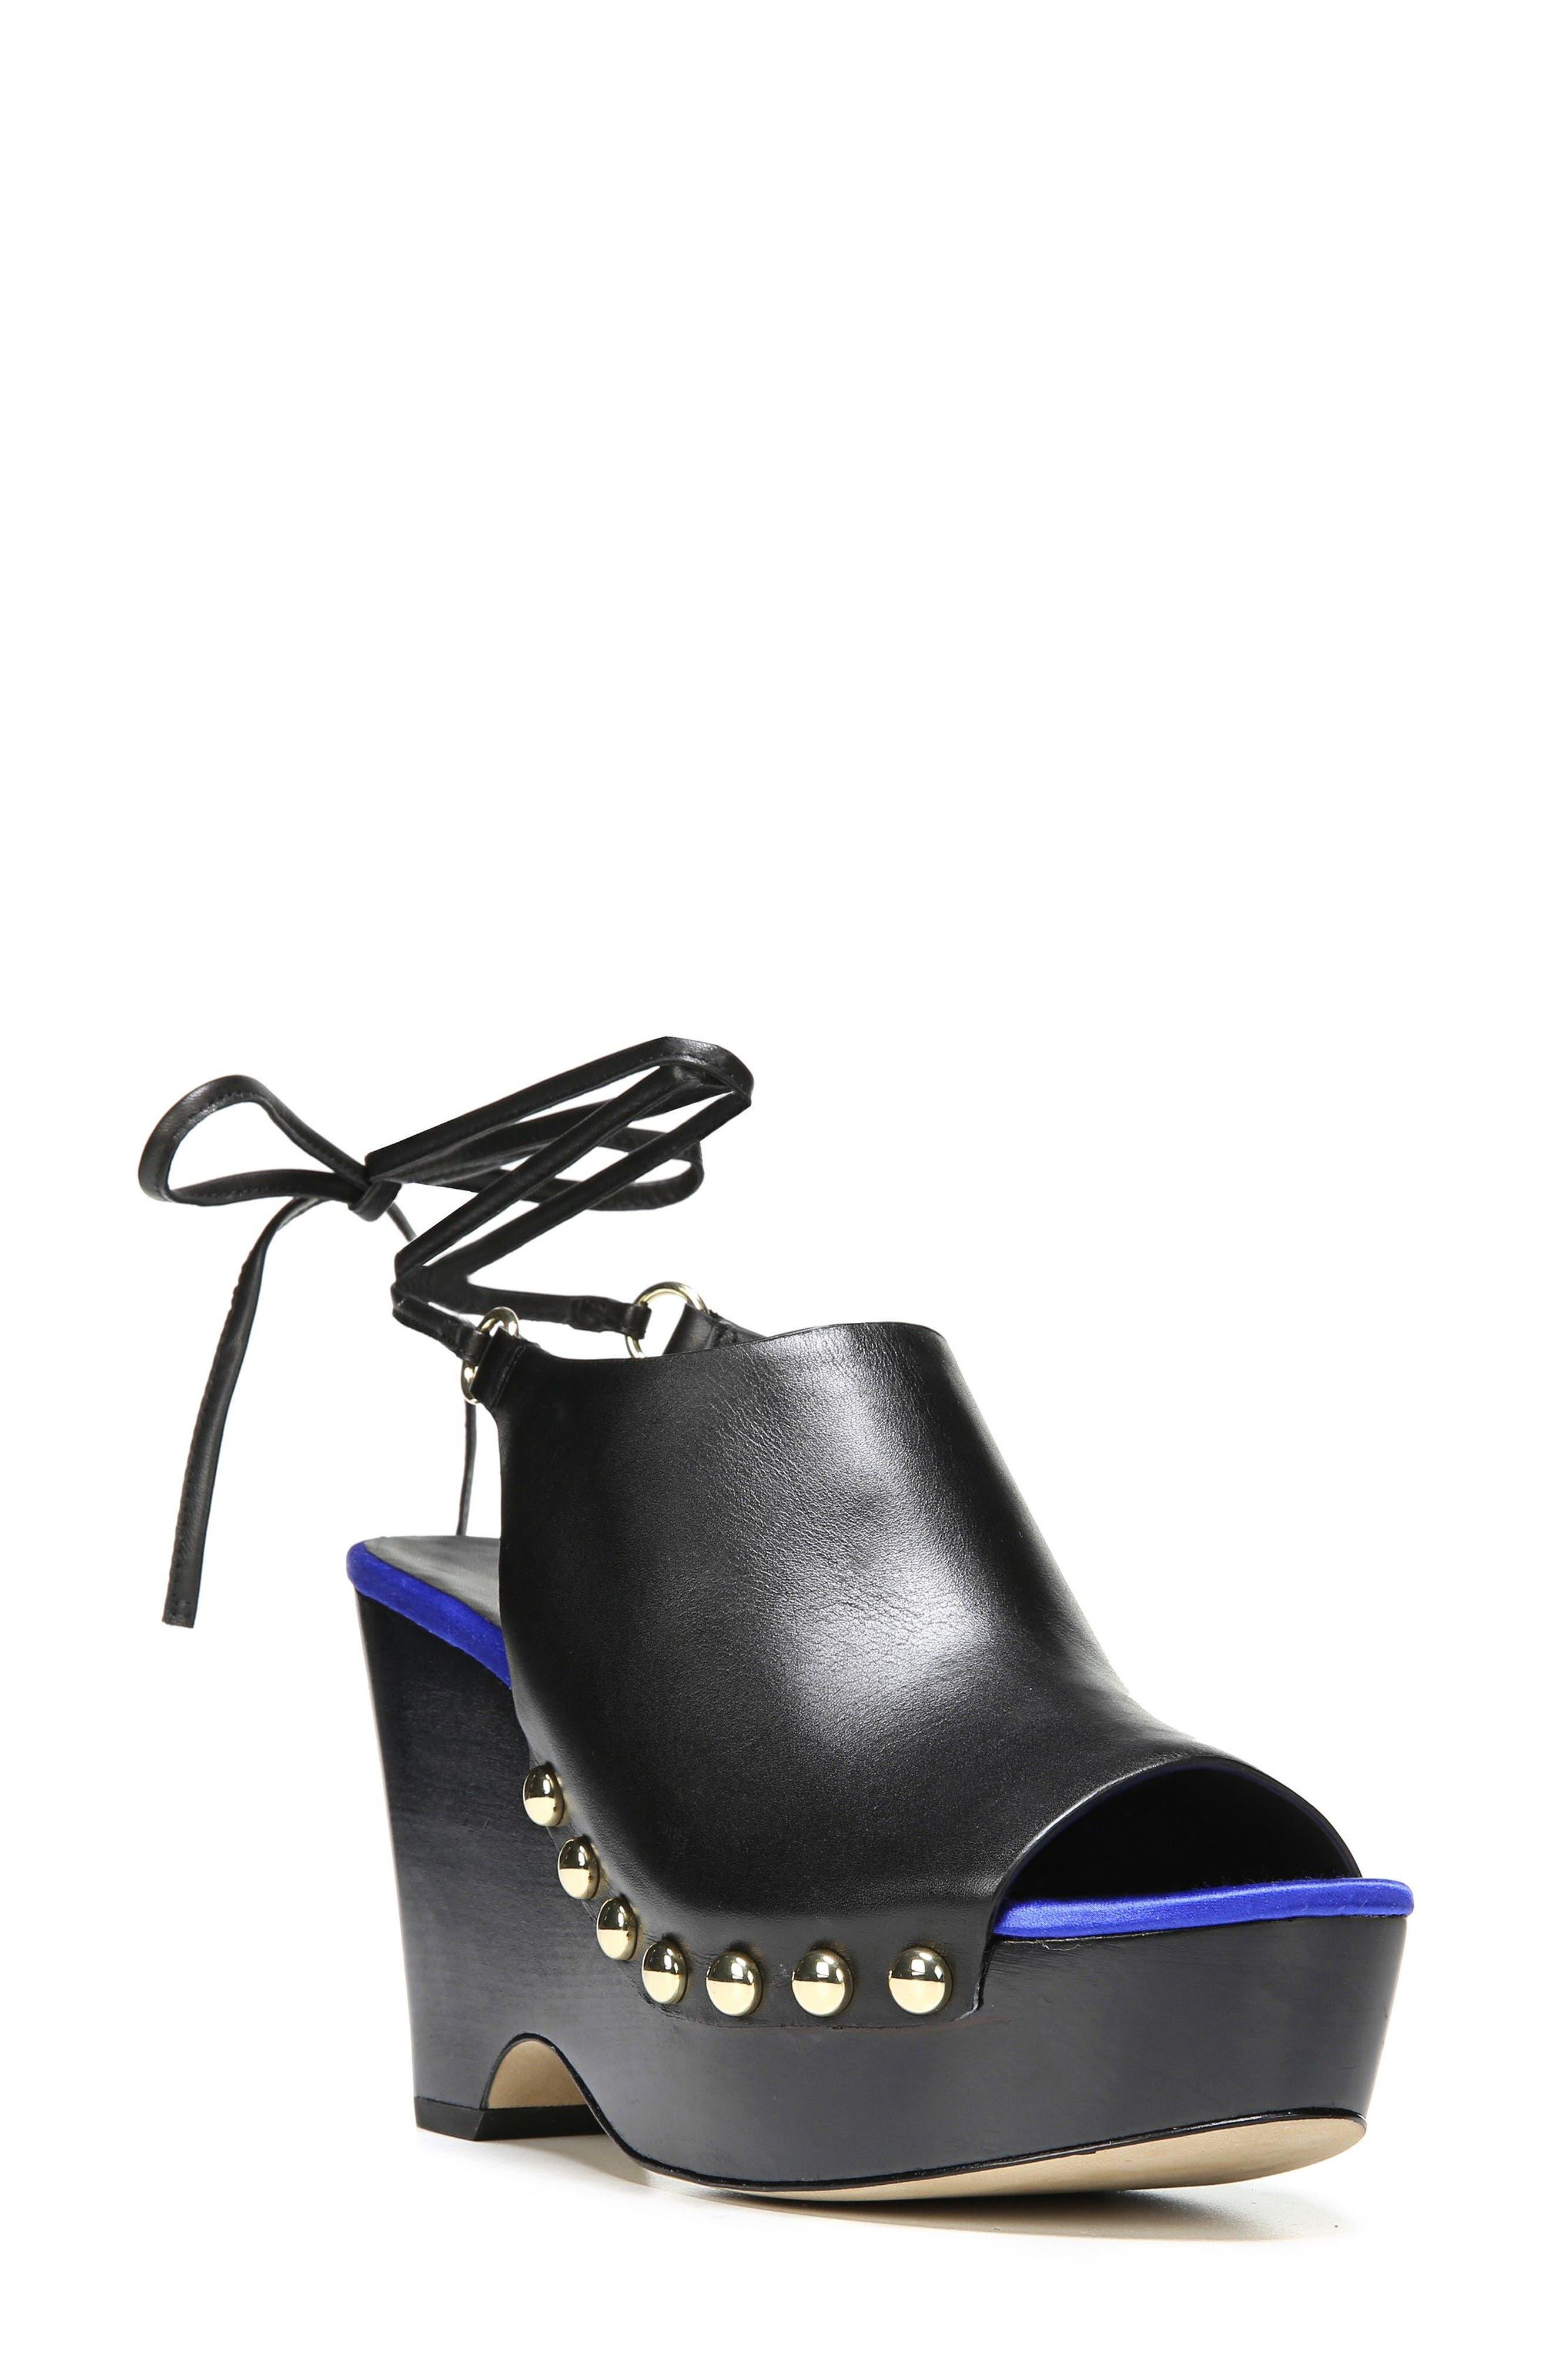 Main Image - Diane Von Furstenberg Bali Wedge Sandal (Women)